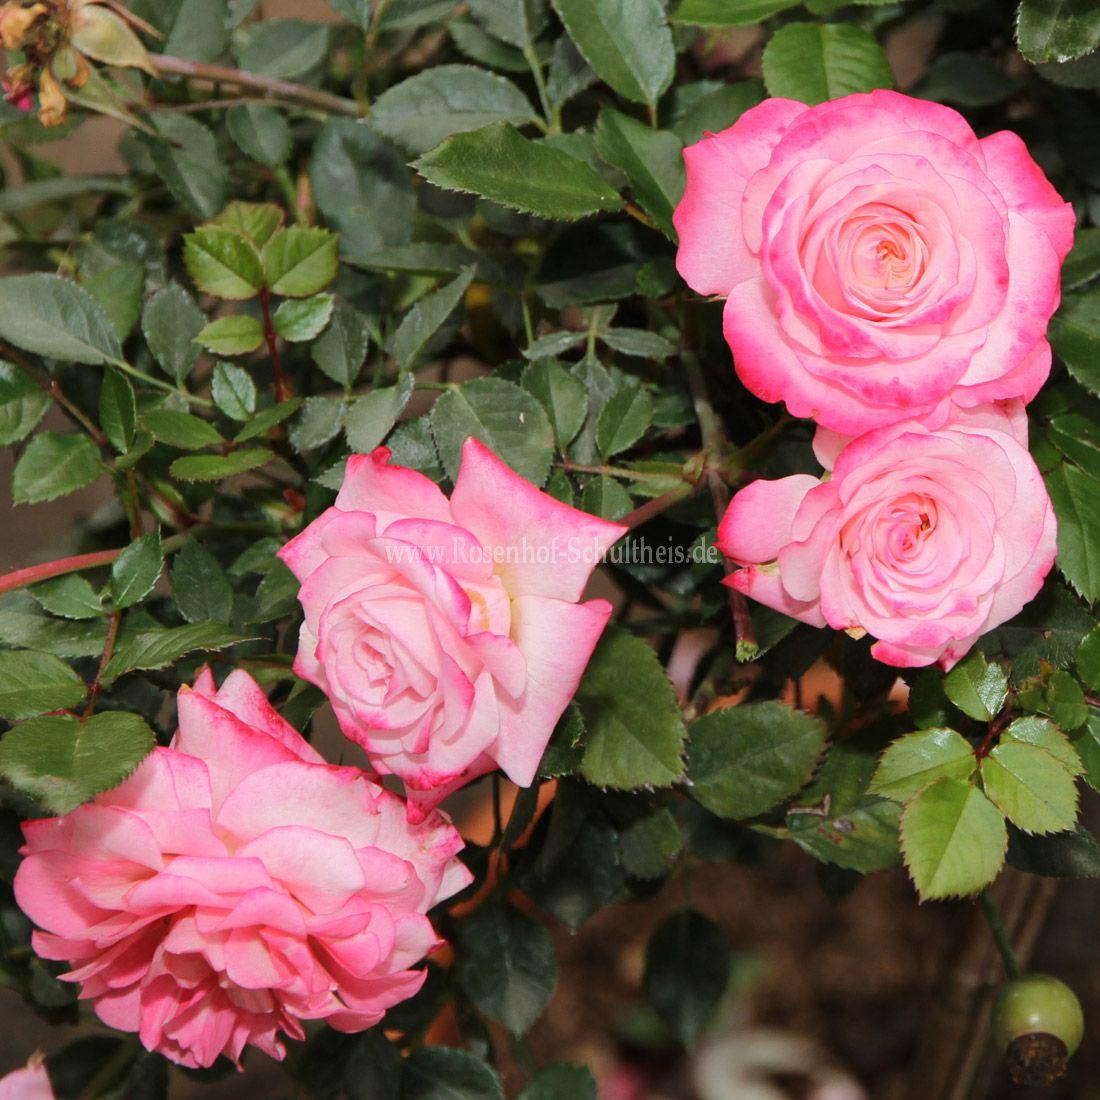 portofino rosen online kaufen im rosenhof schultheis. Black Bedroom Furniture Sets. Home Design Ideas